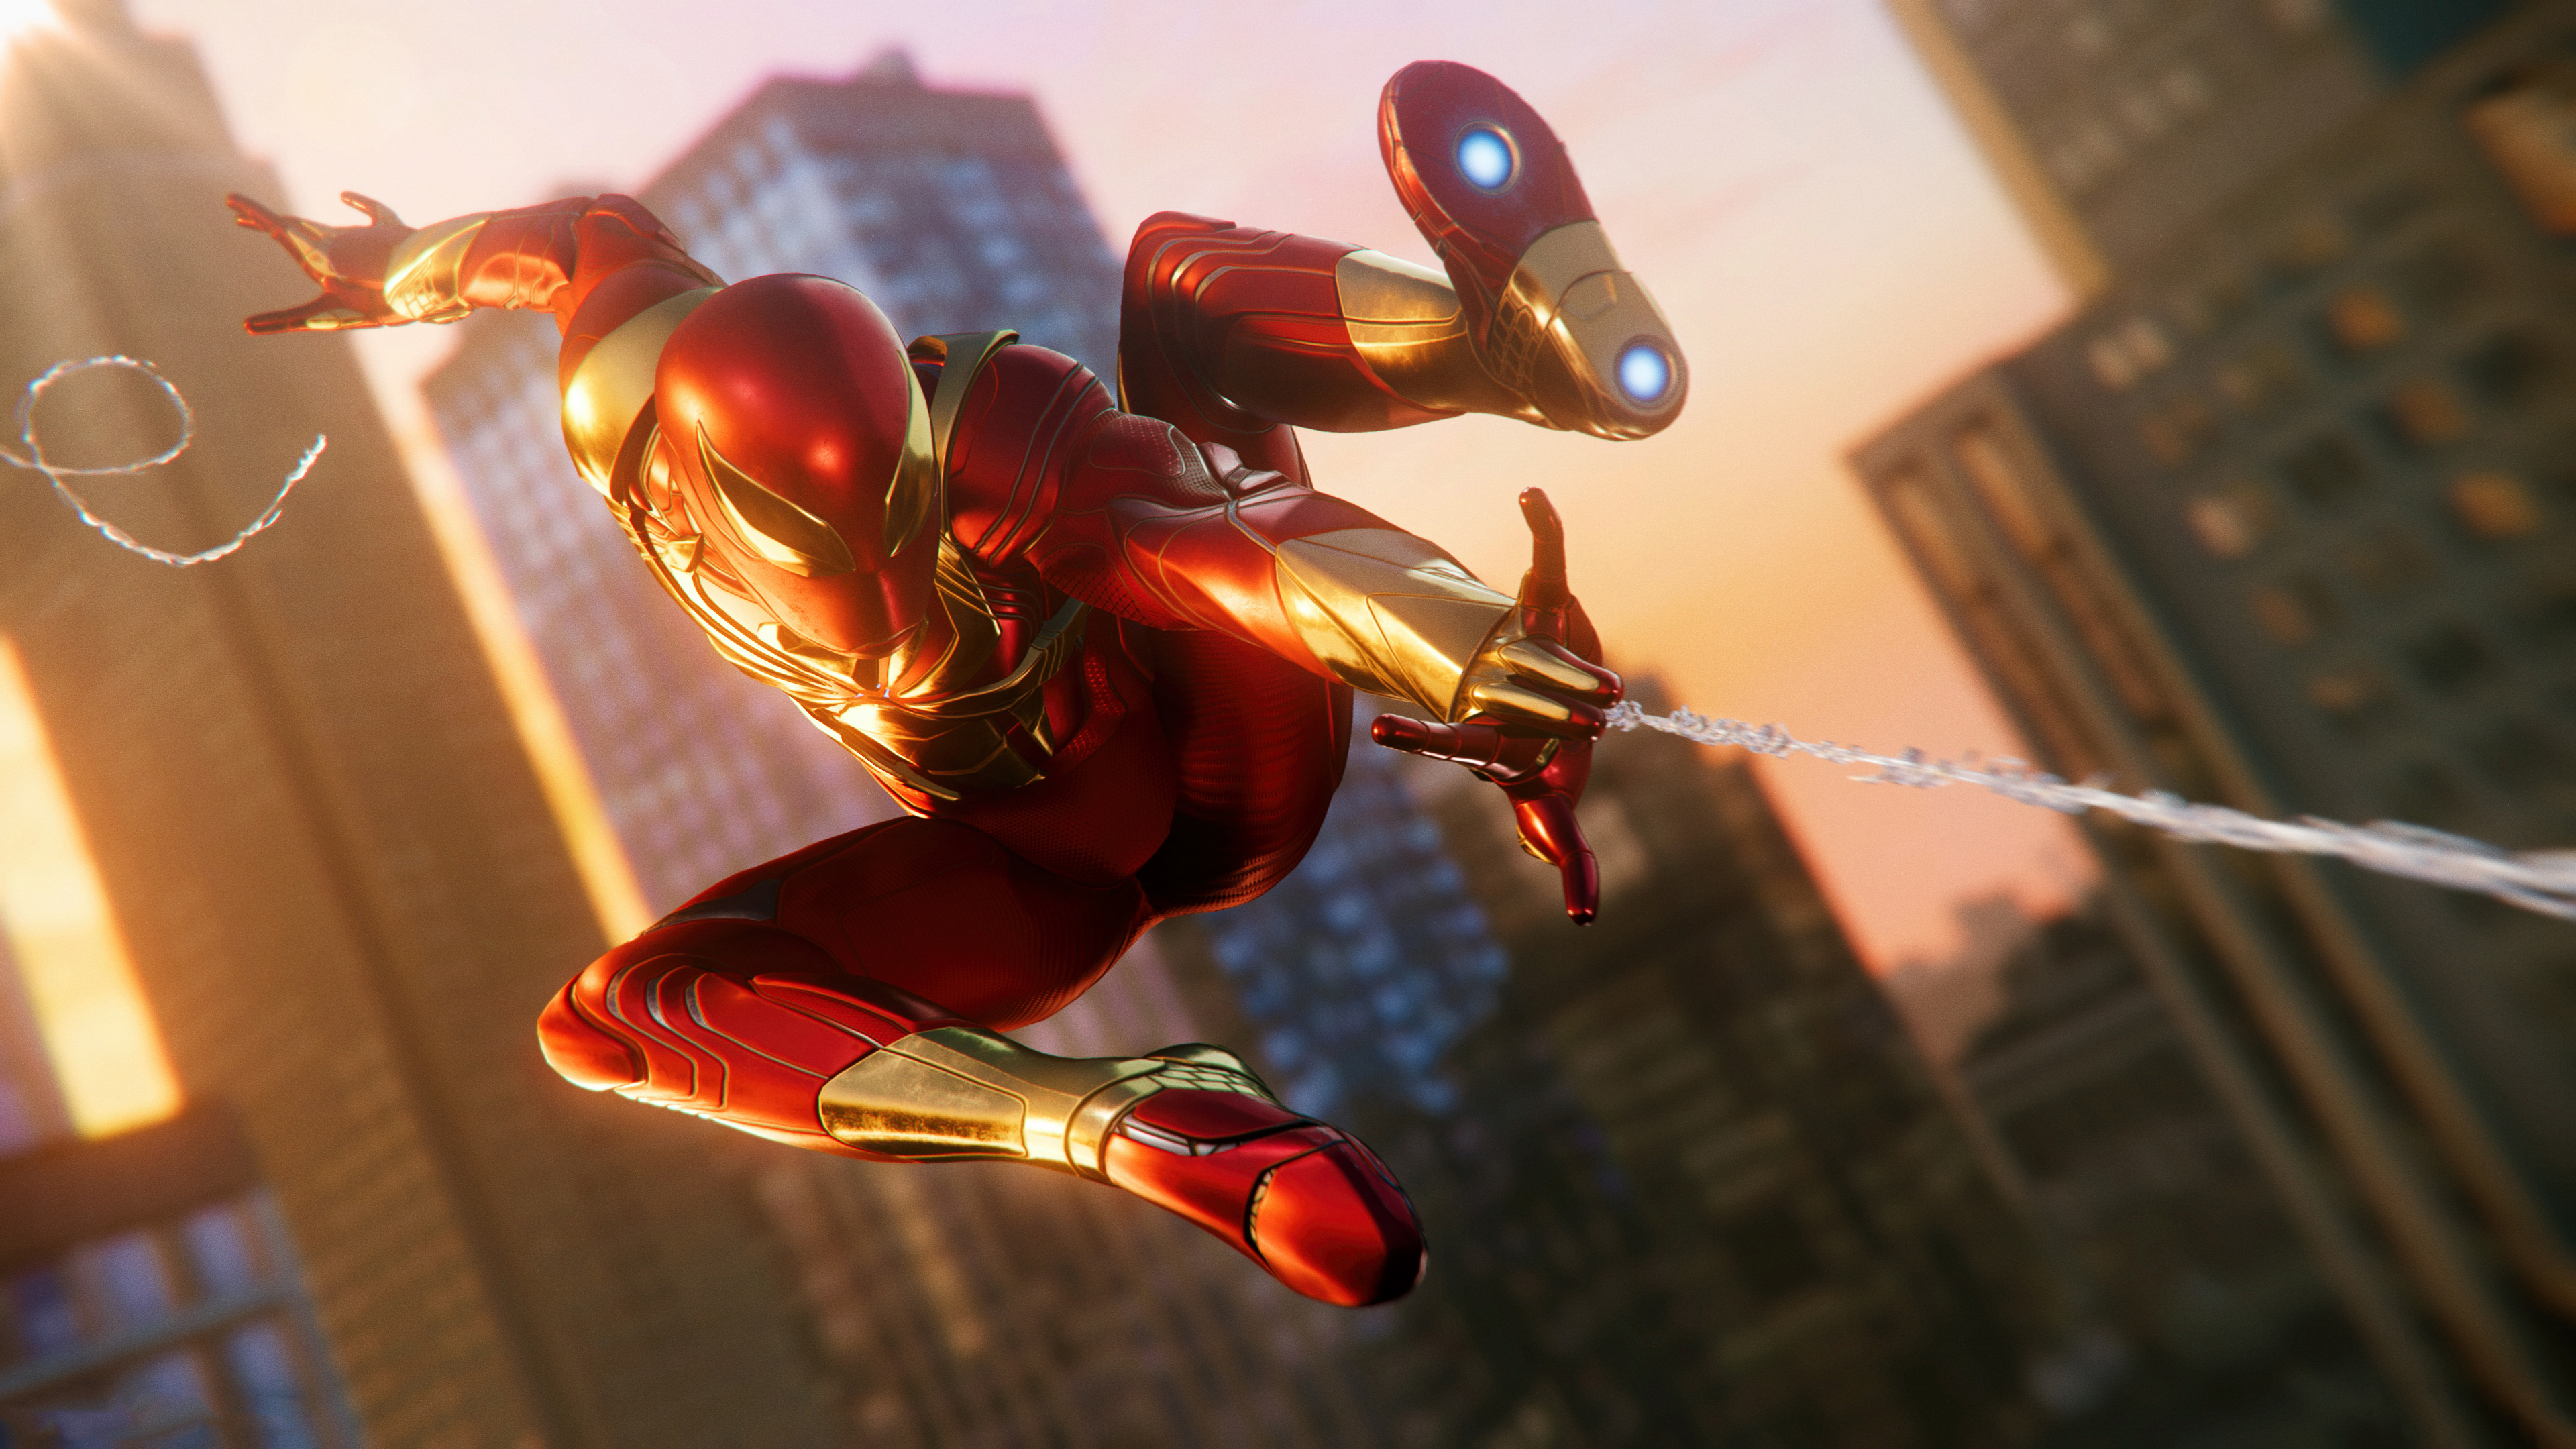 Spider Man Ps4 4k Ultra Hd Wallpaper Background Image